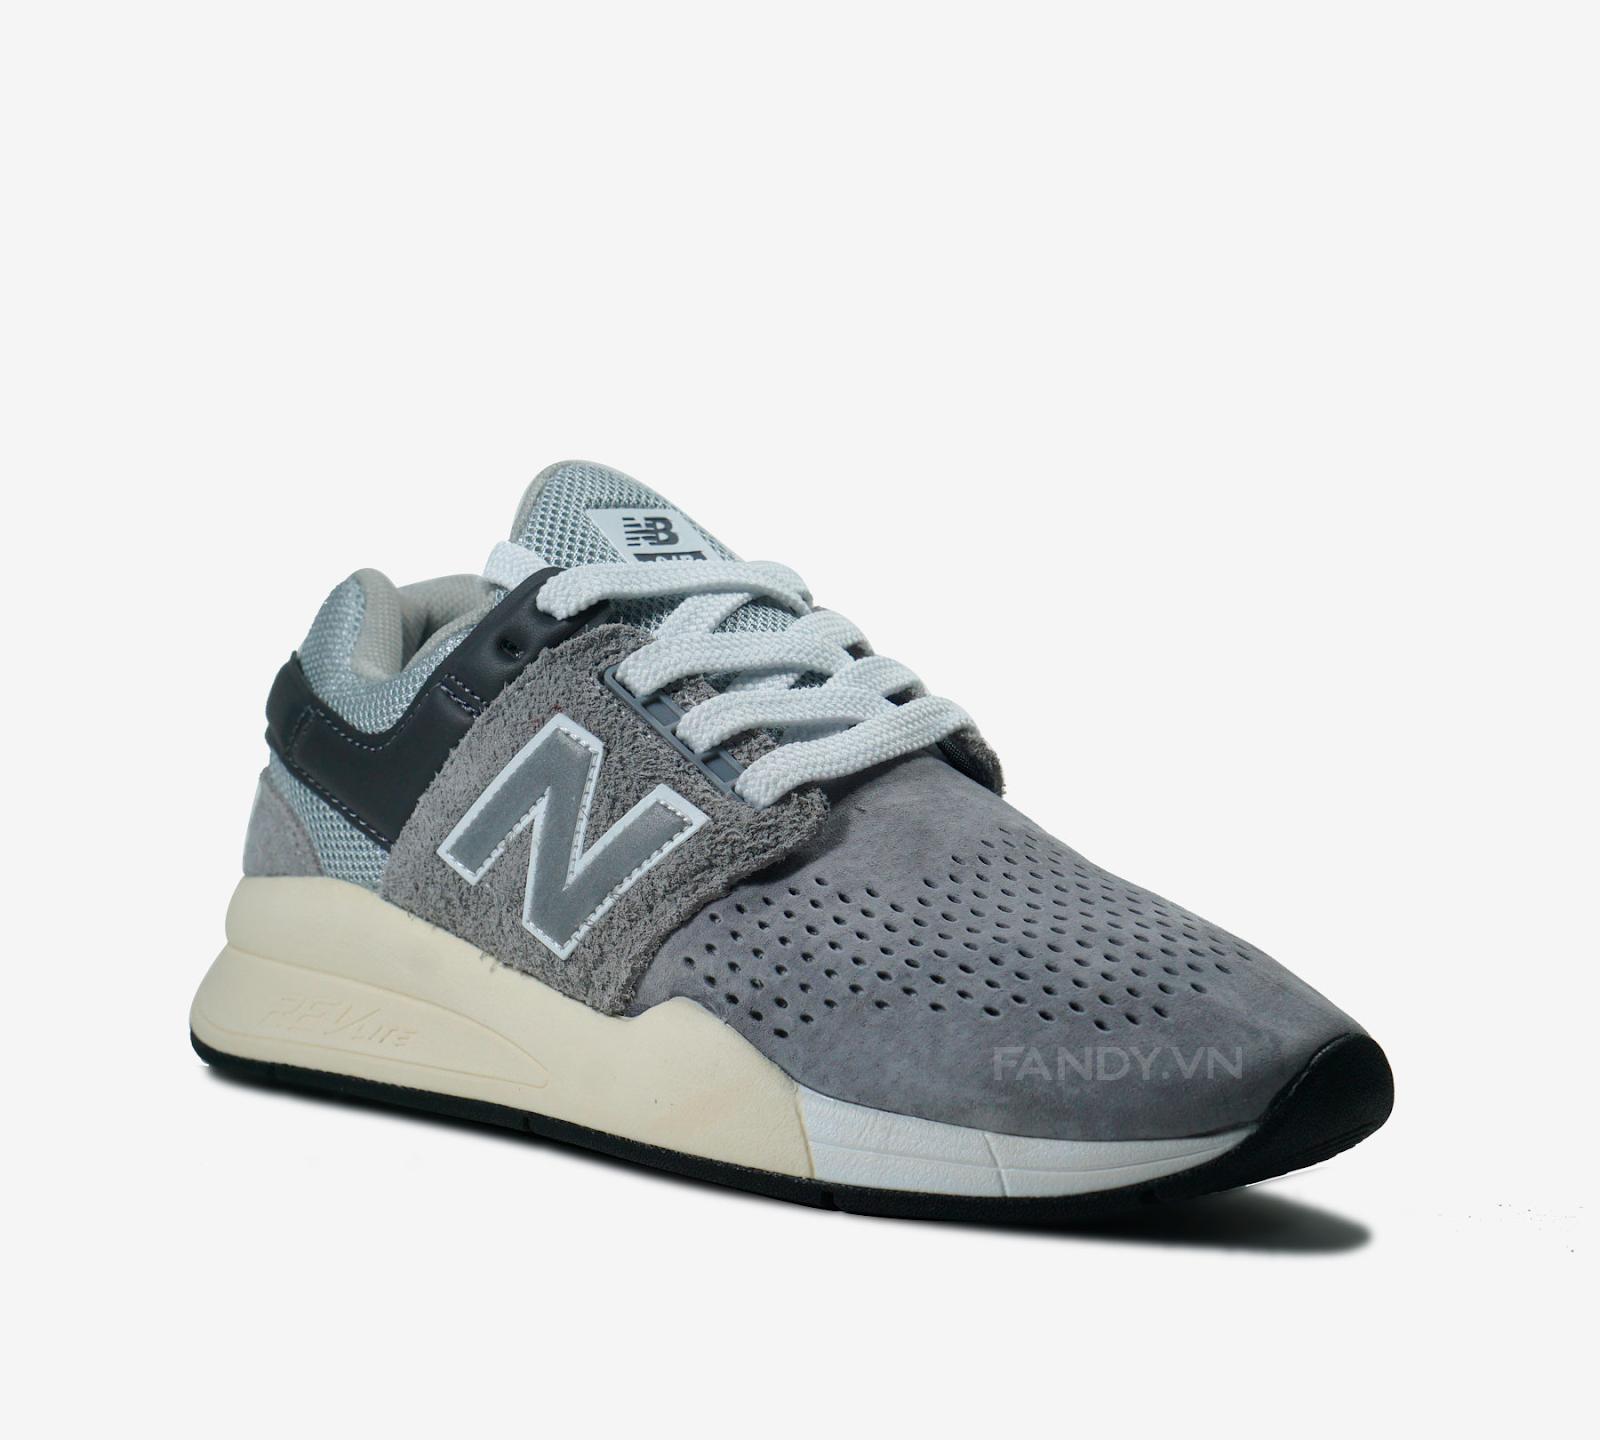 Giày New Balance 247